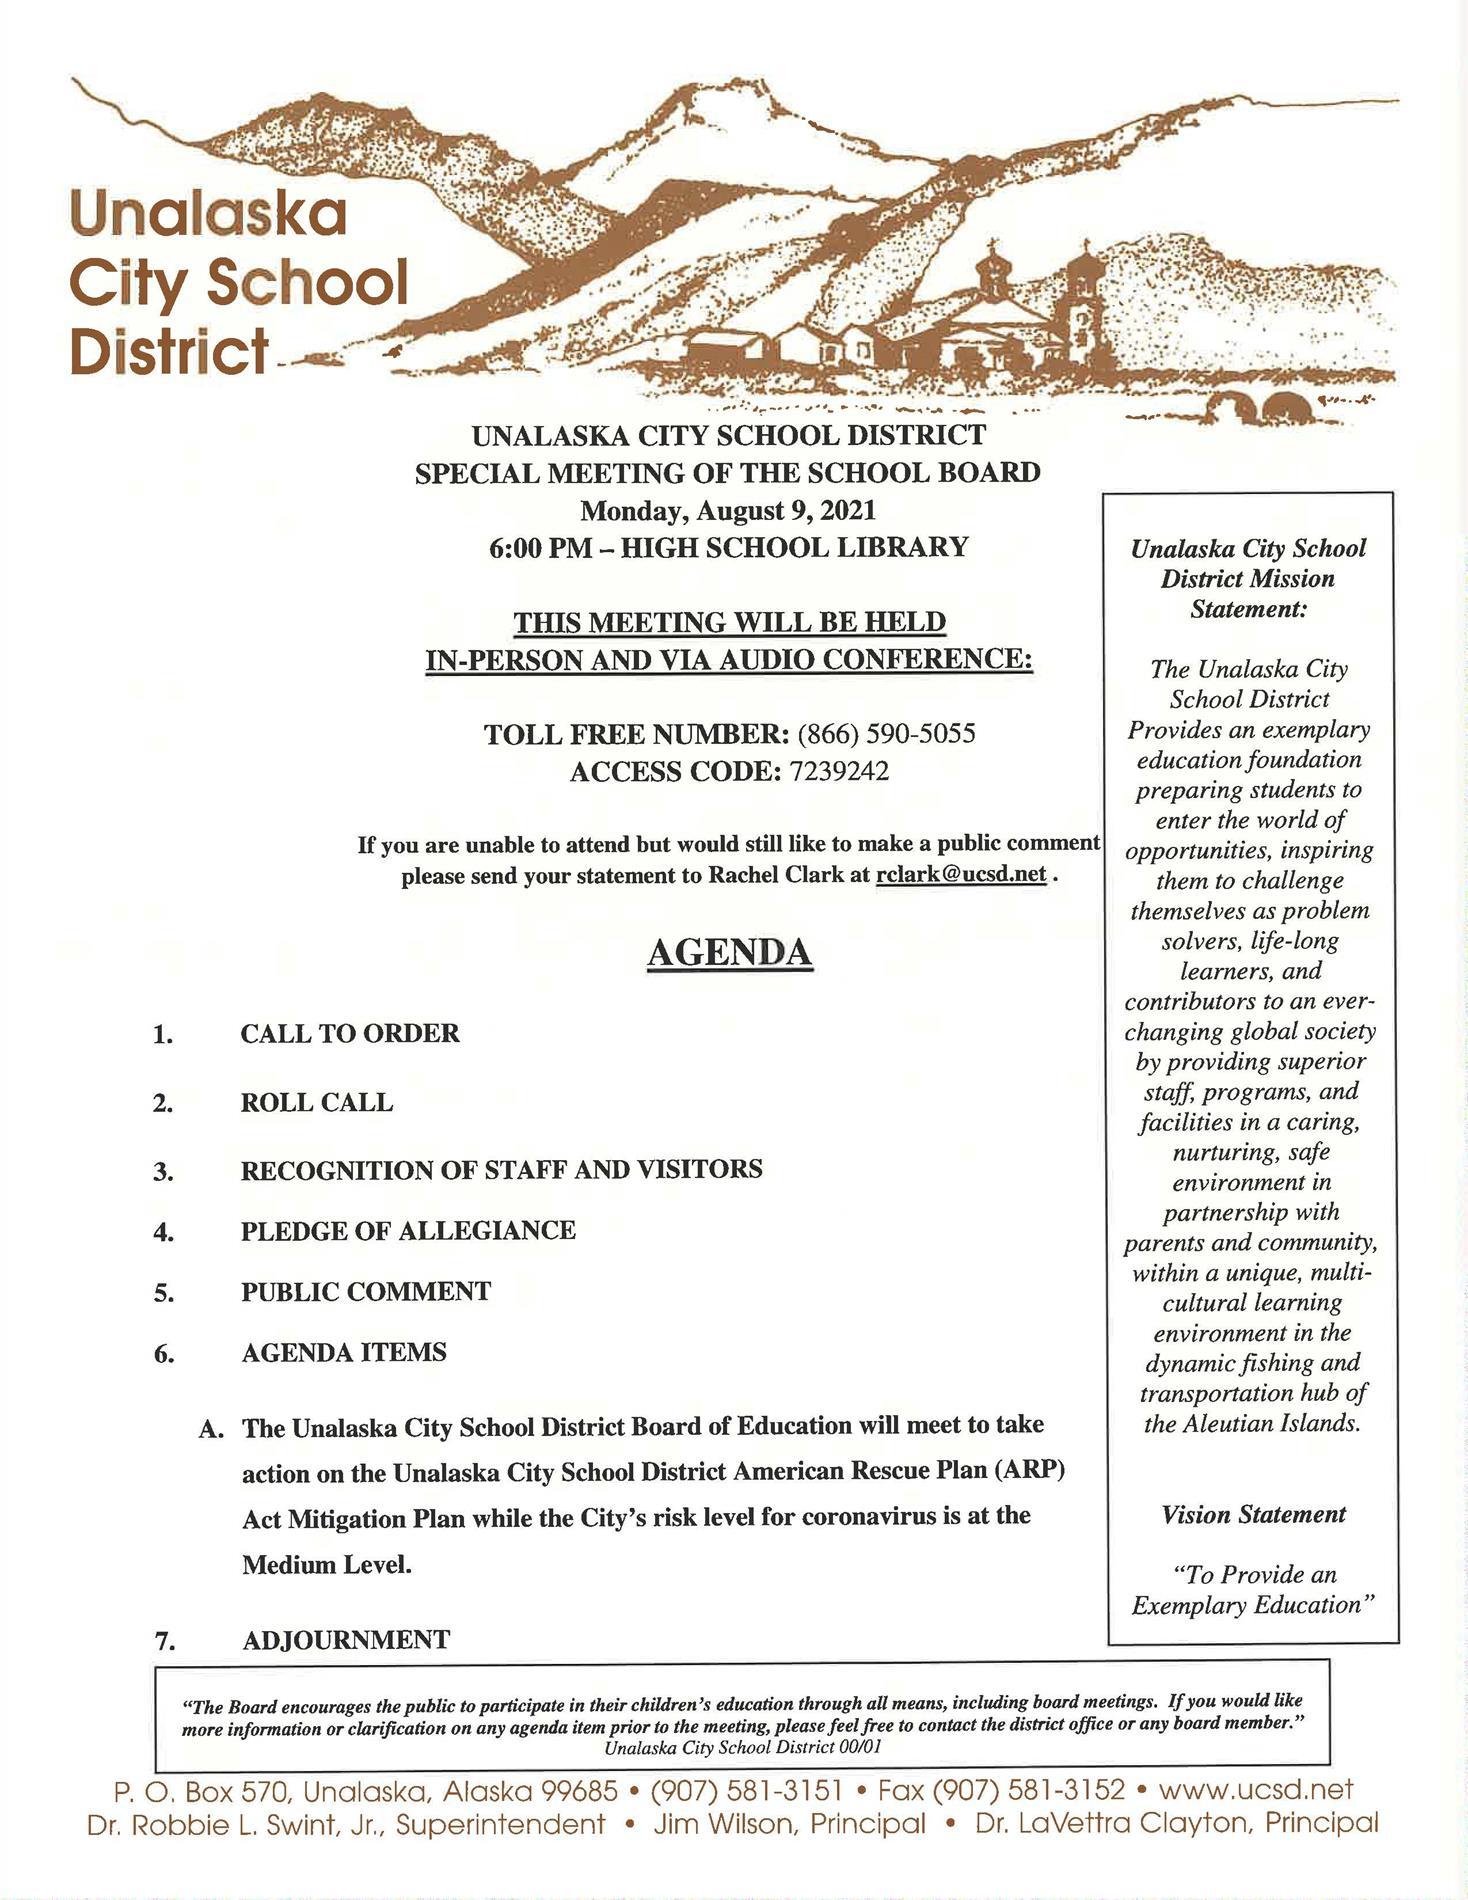 08/19/2021 Special Board Meeting Agenda